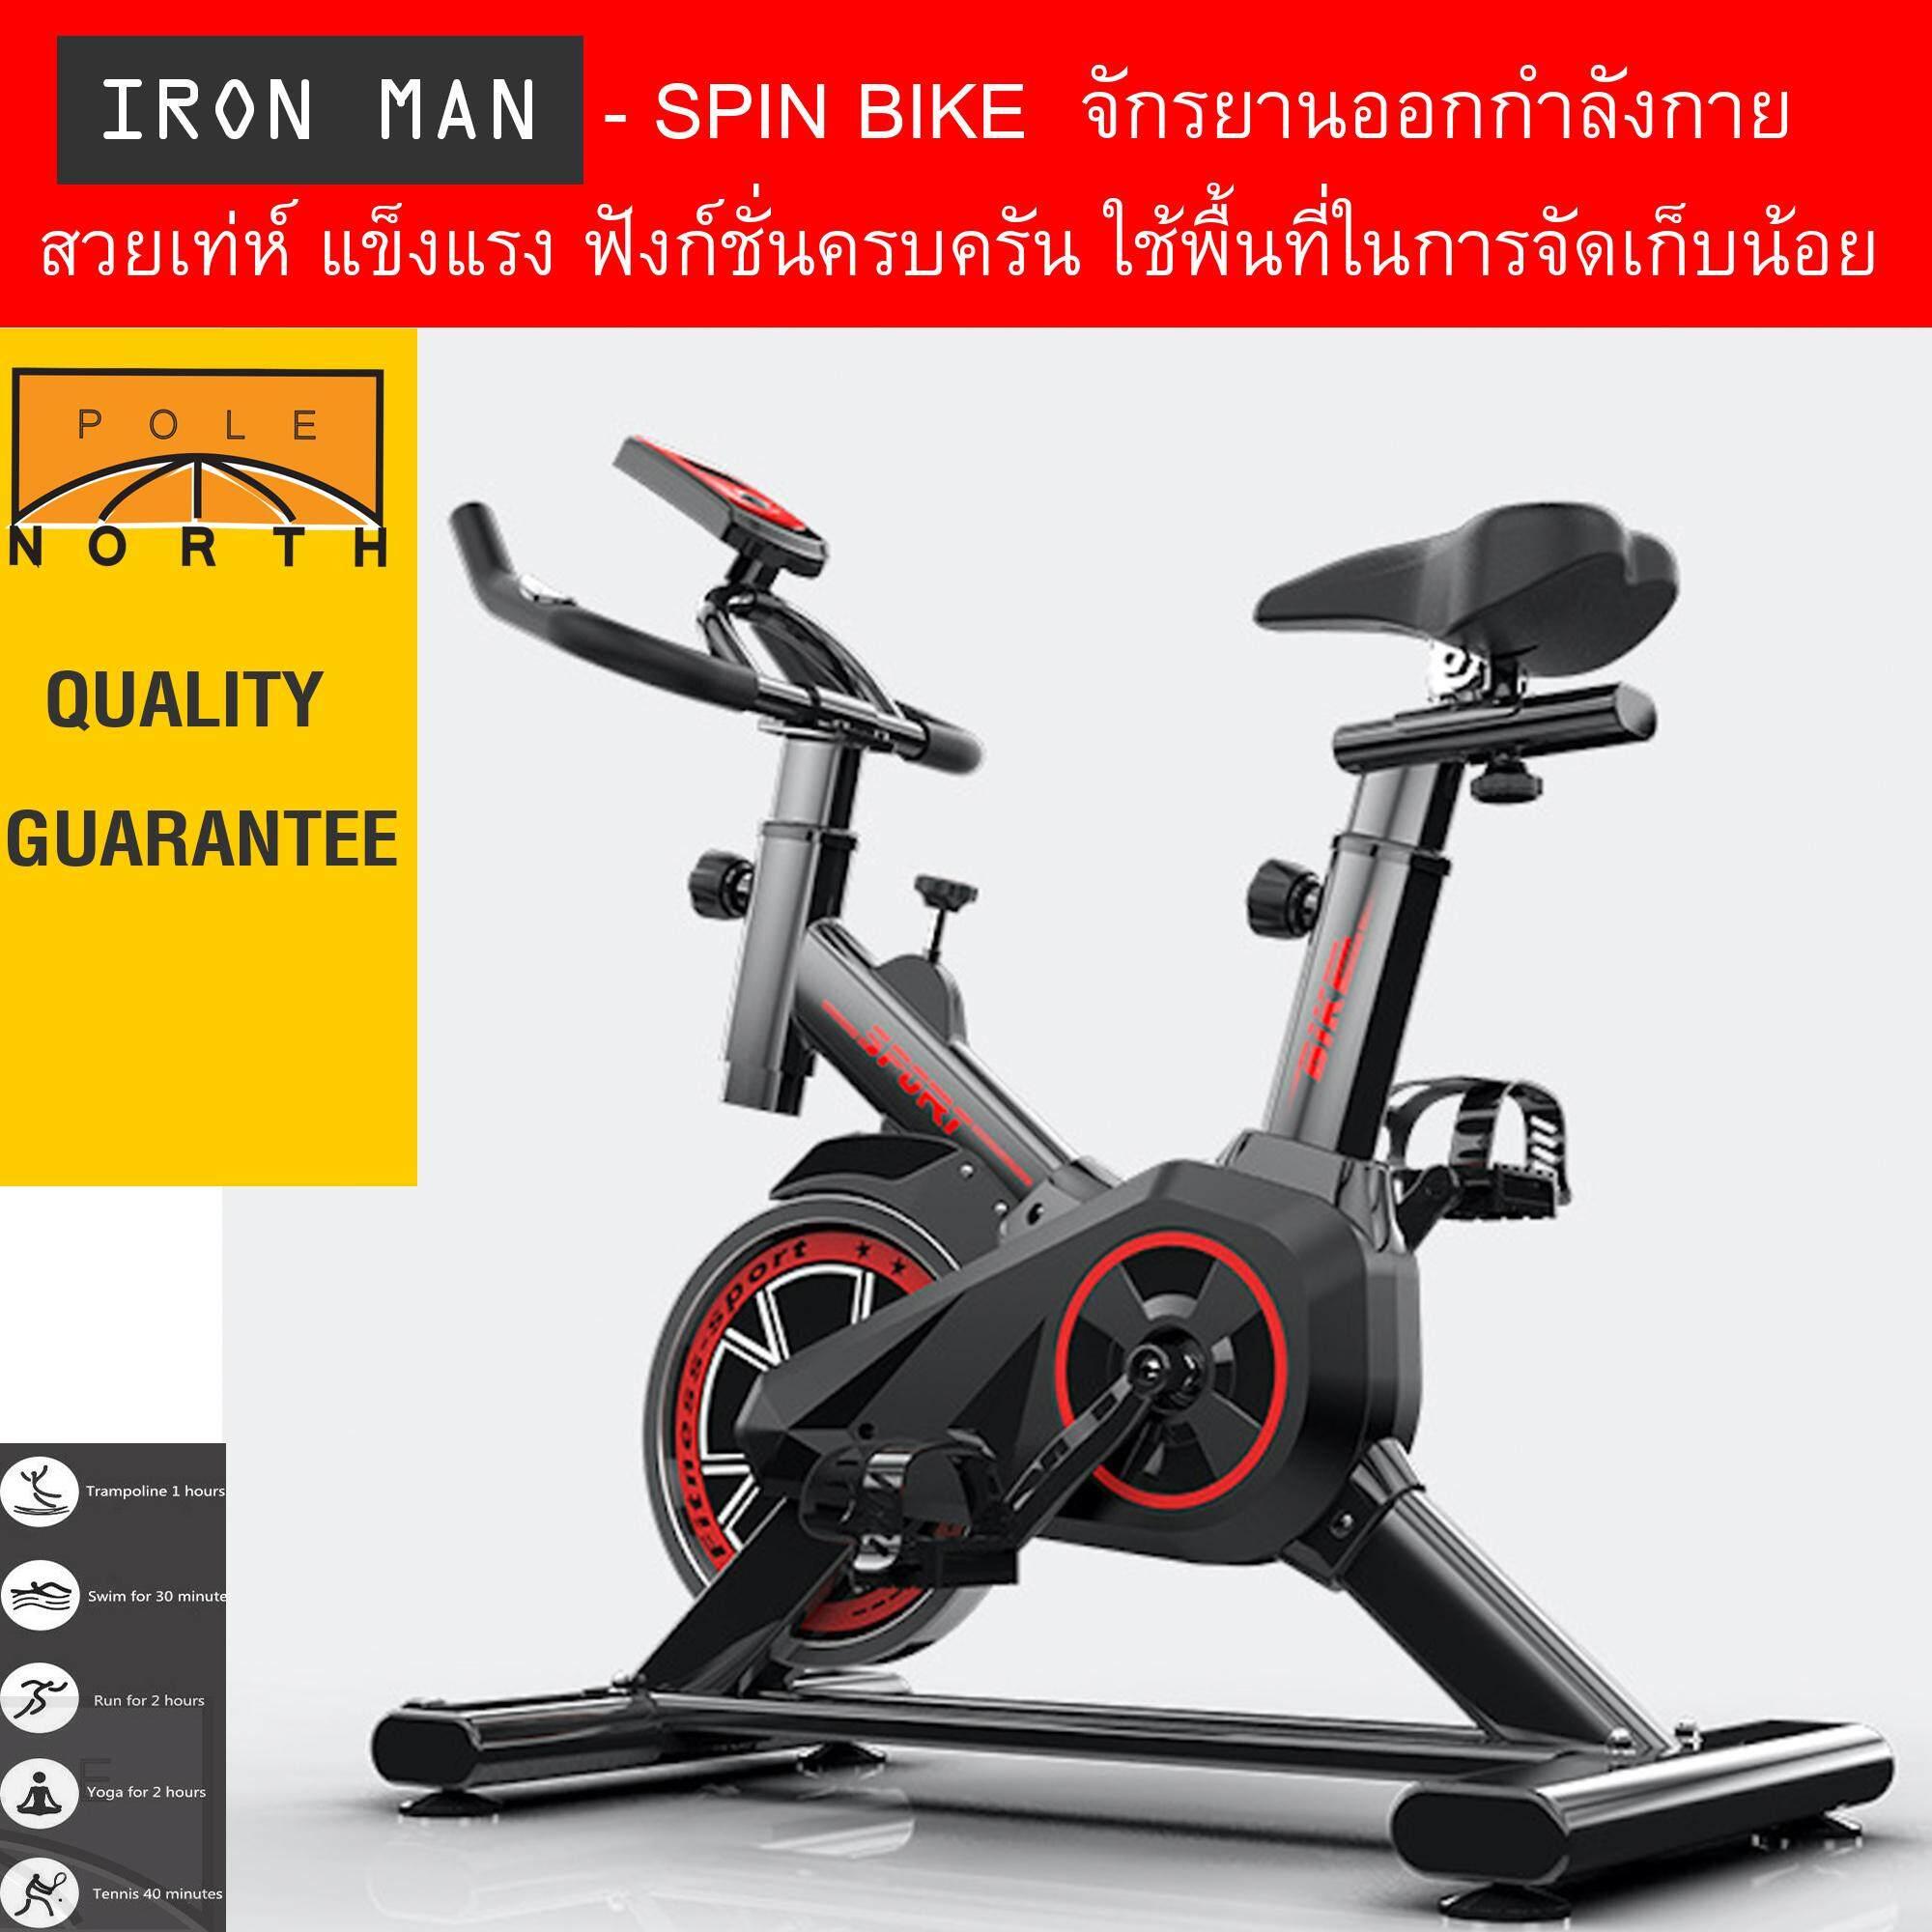 Dbr เครื่องออกกำลังกาย จักรยานออกกำลังกาย มีพนักพิง จักรยานนั่งปั่น จักรยานเอนปั่น เสริมกล้ามเนื้อ ลดต้นขา รุ่น Exercise Spin Bike Spb-7000ba สีดำ By Double Rich.